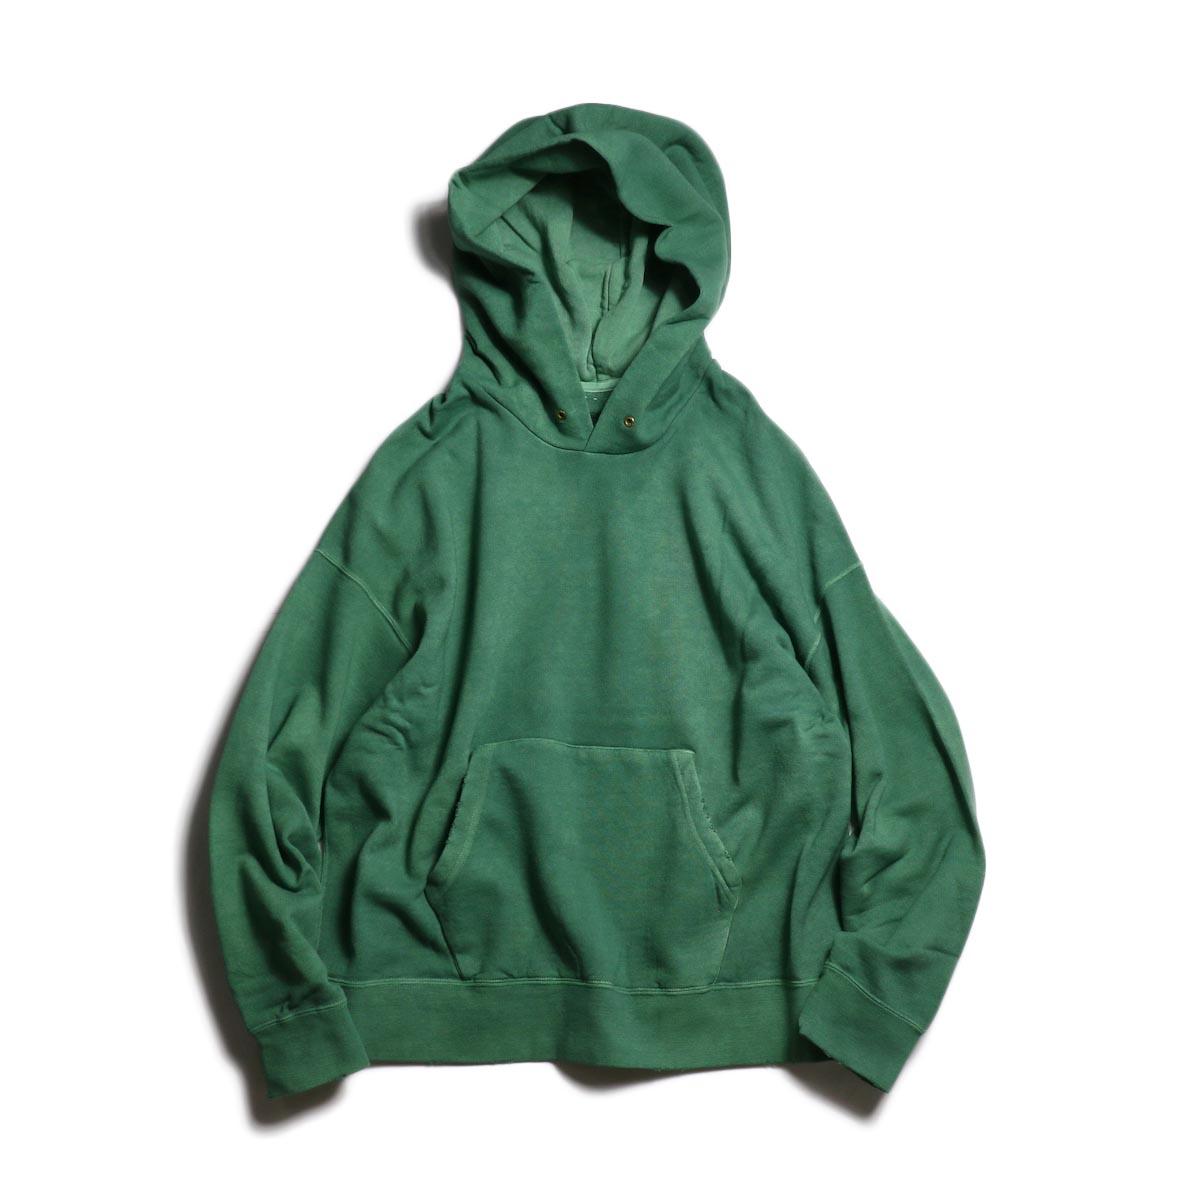 visvim / AMPLUS HOODIE P.O. (UNEVEN DYE) (Green)